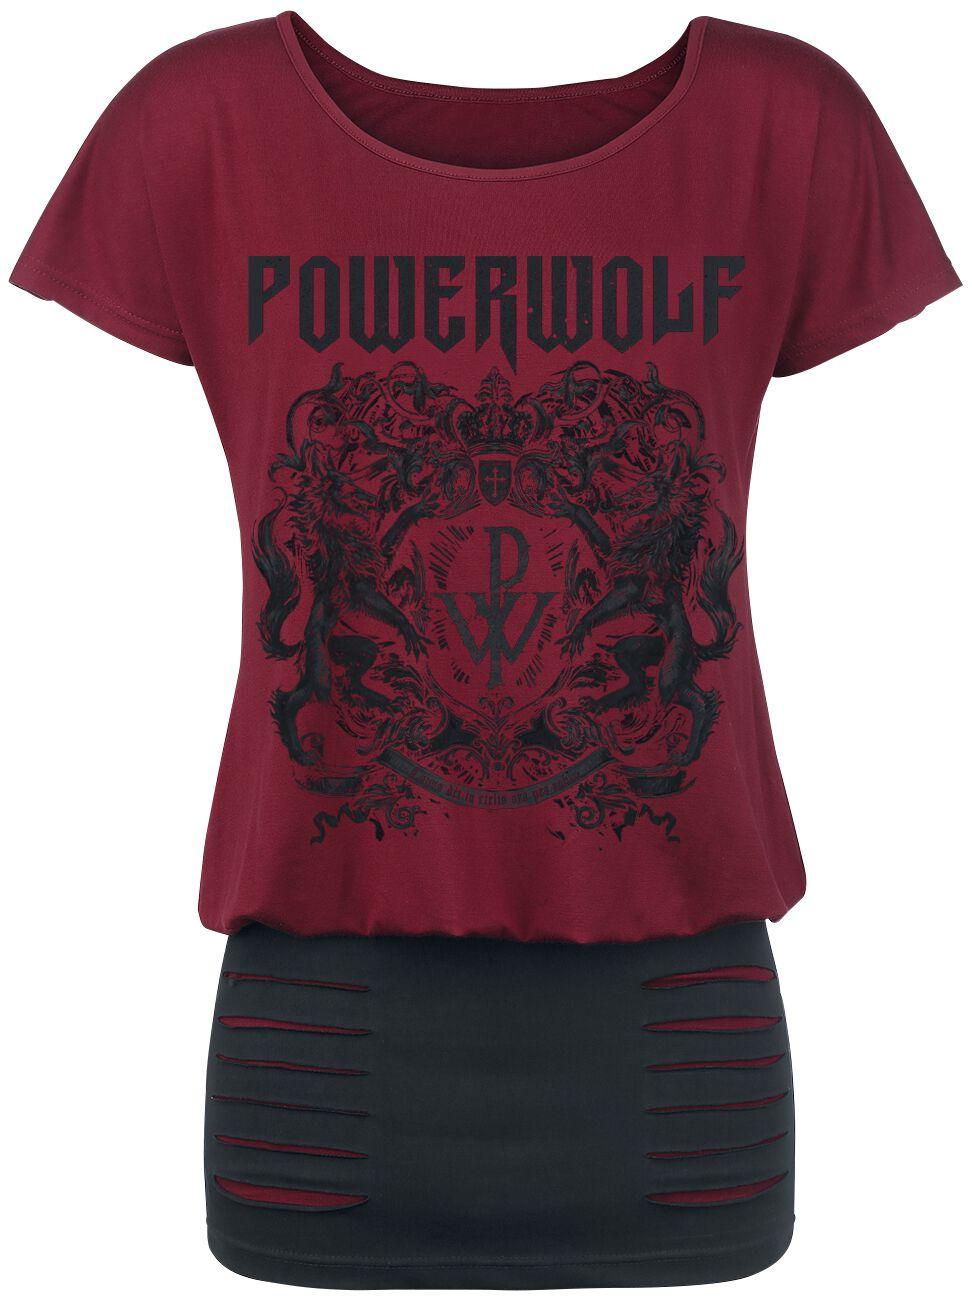 Image of   Powerwolf Crest - Metal Is Religion Kjole rød-sort